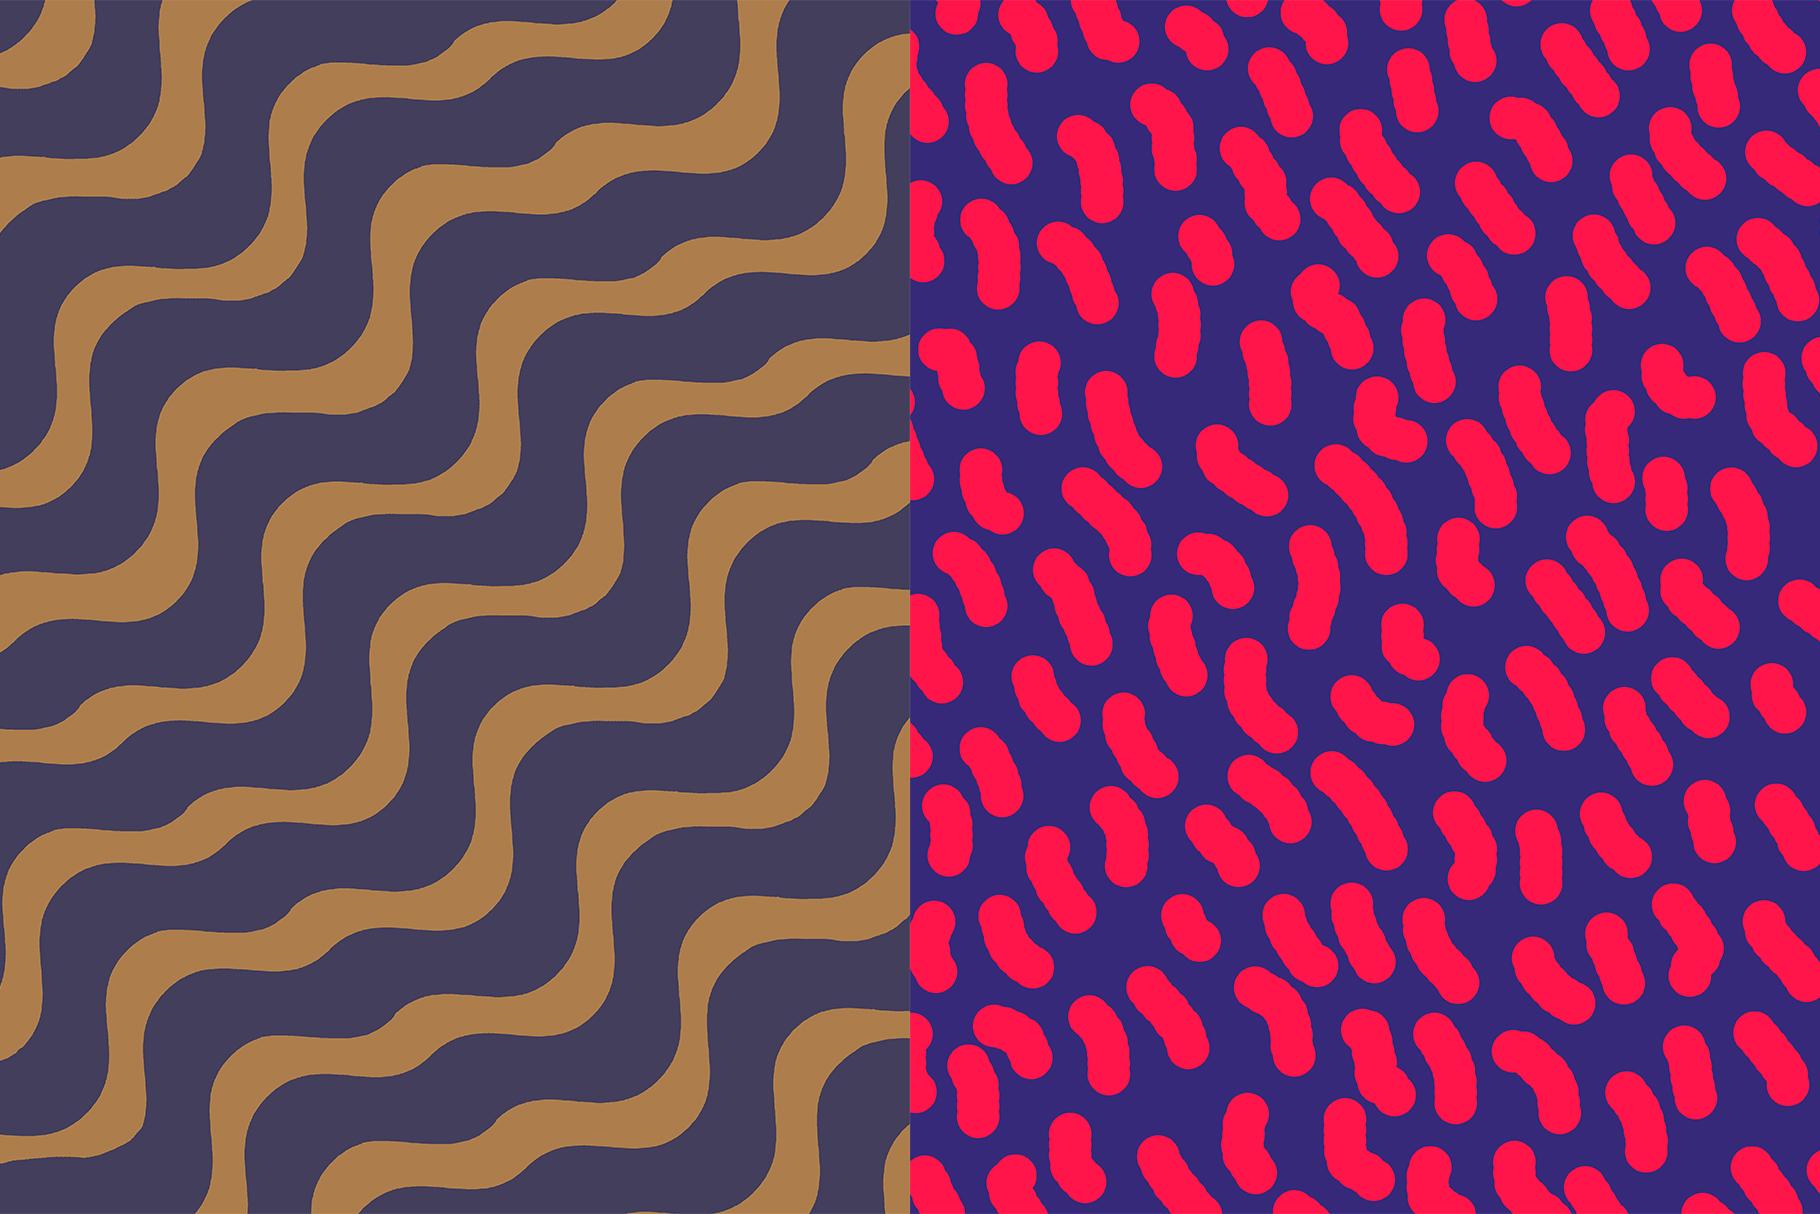 10 Geometric and Liquid Pattern example image 9